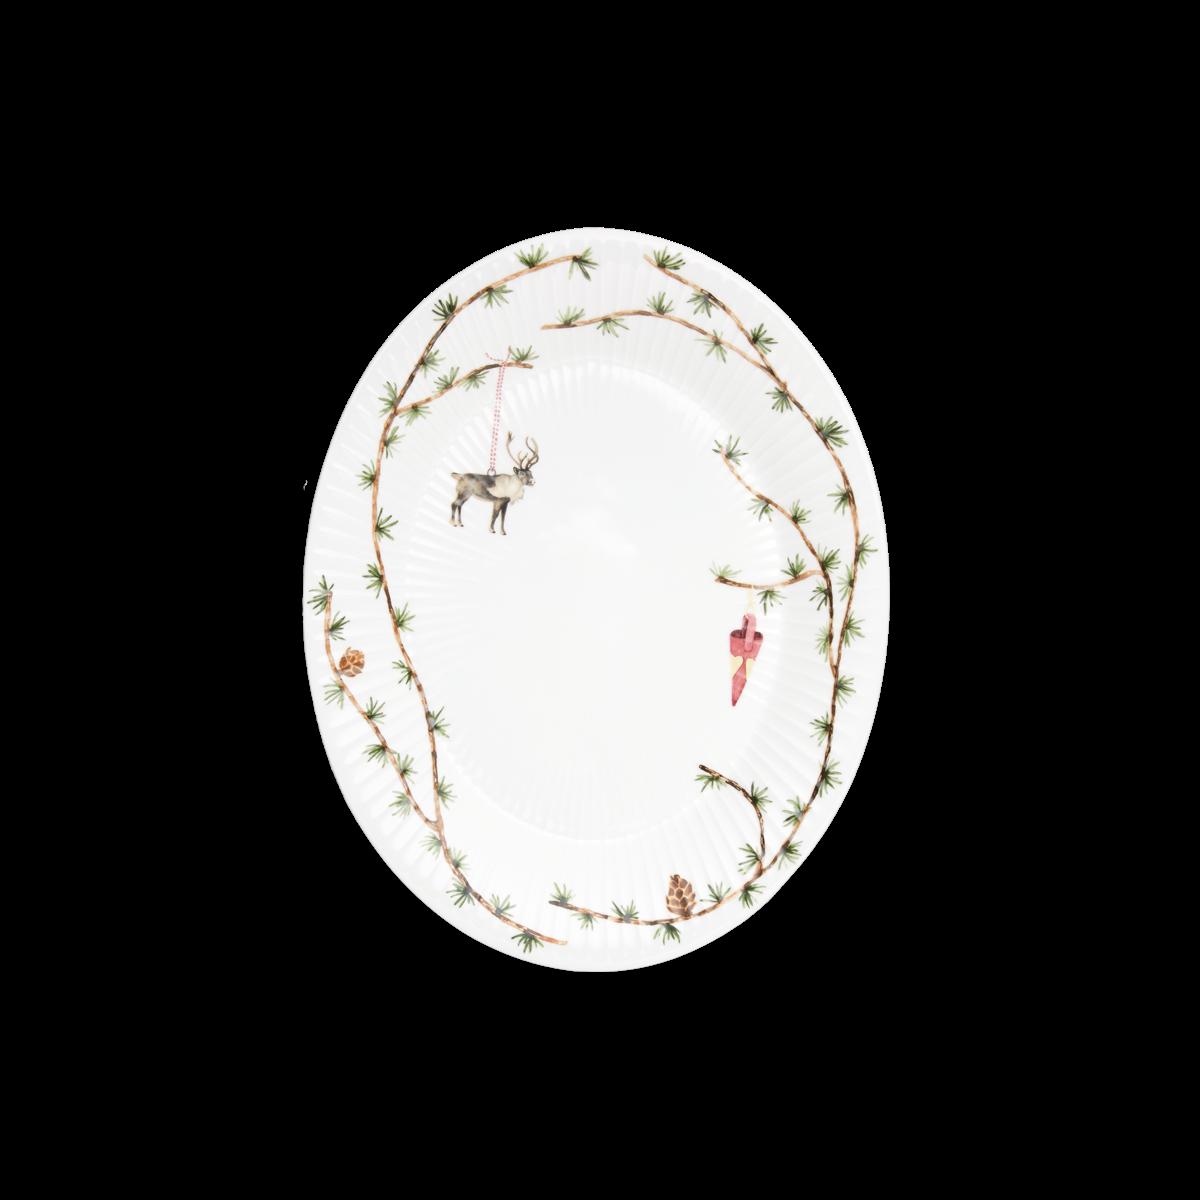 Kähler - Hammershøi Christmas Ovalt Table Dish Medium - White With Deko (693206)